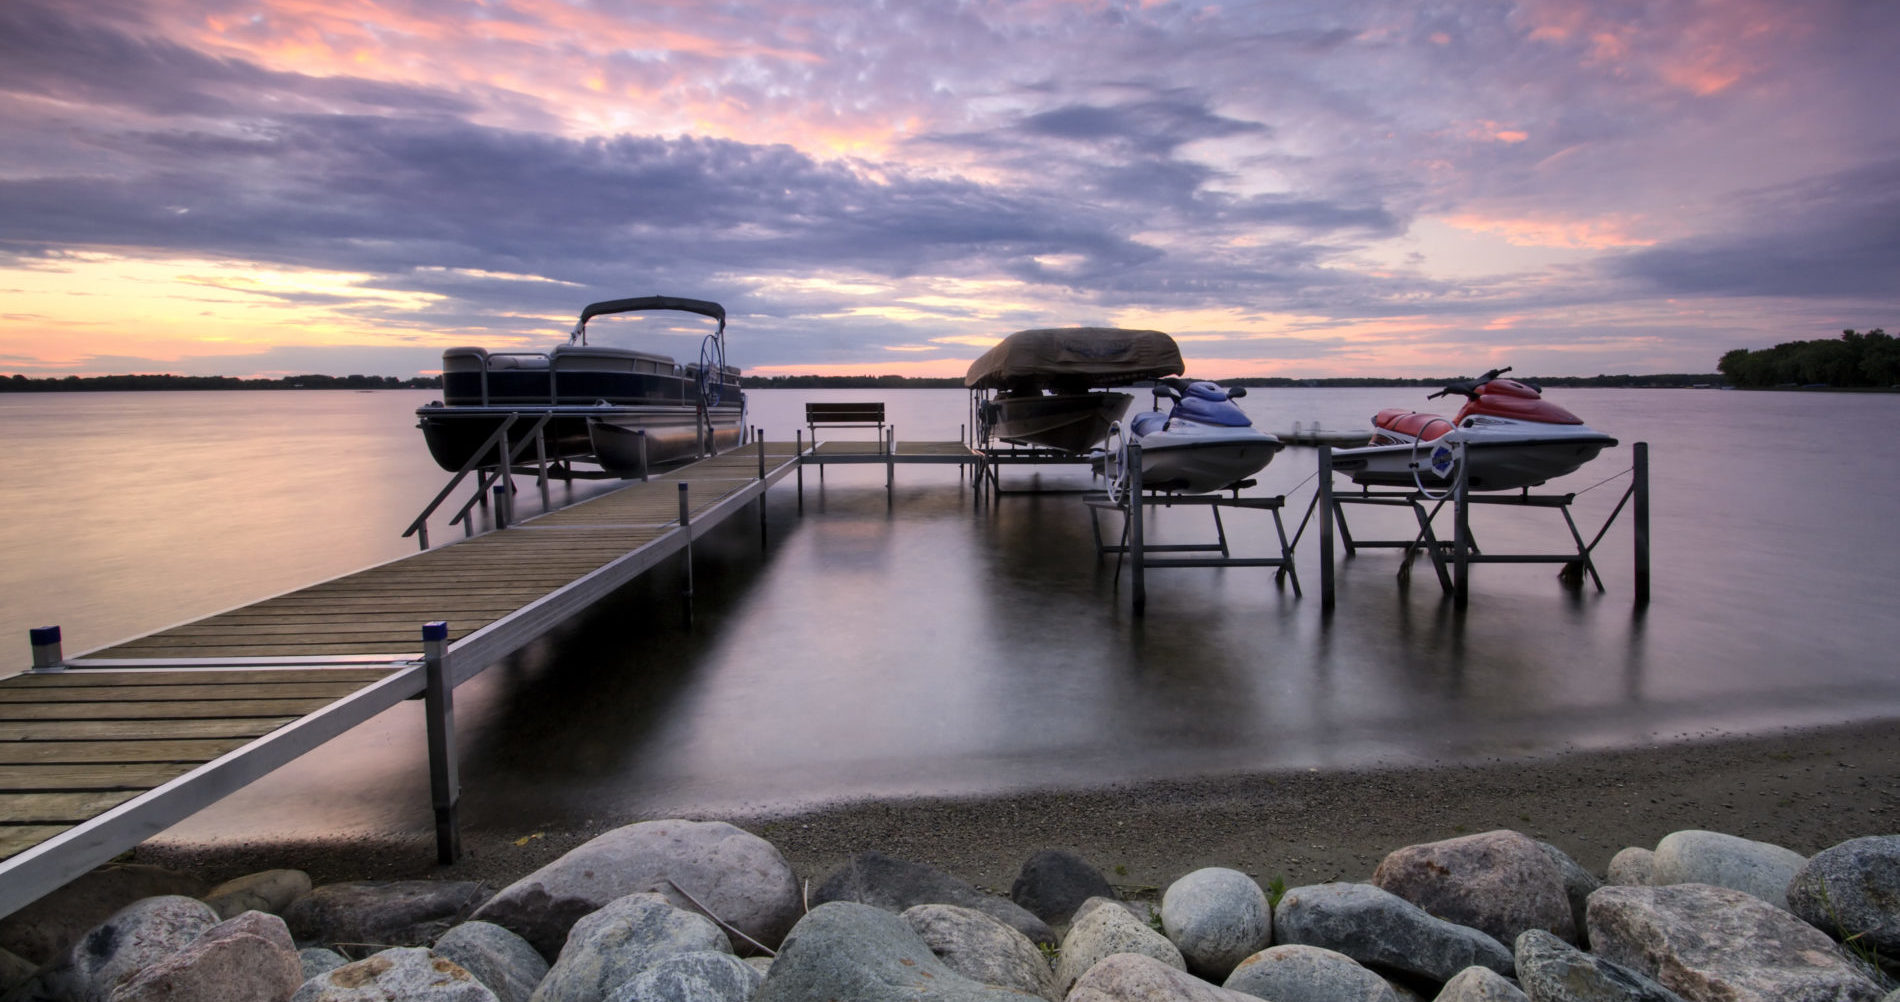 instadock dock, docking, boat lifts, floating dock, portable docks, lakes, alberta, manitoba, saskatchewan